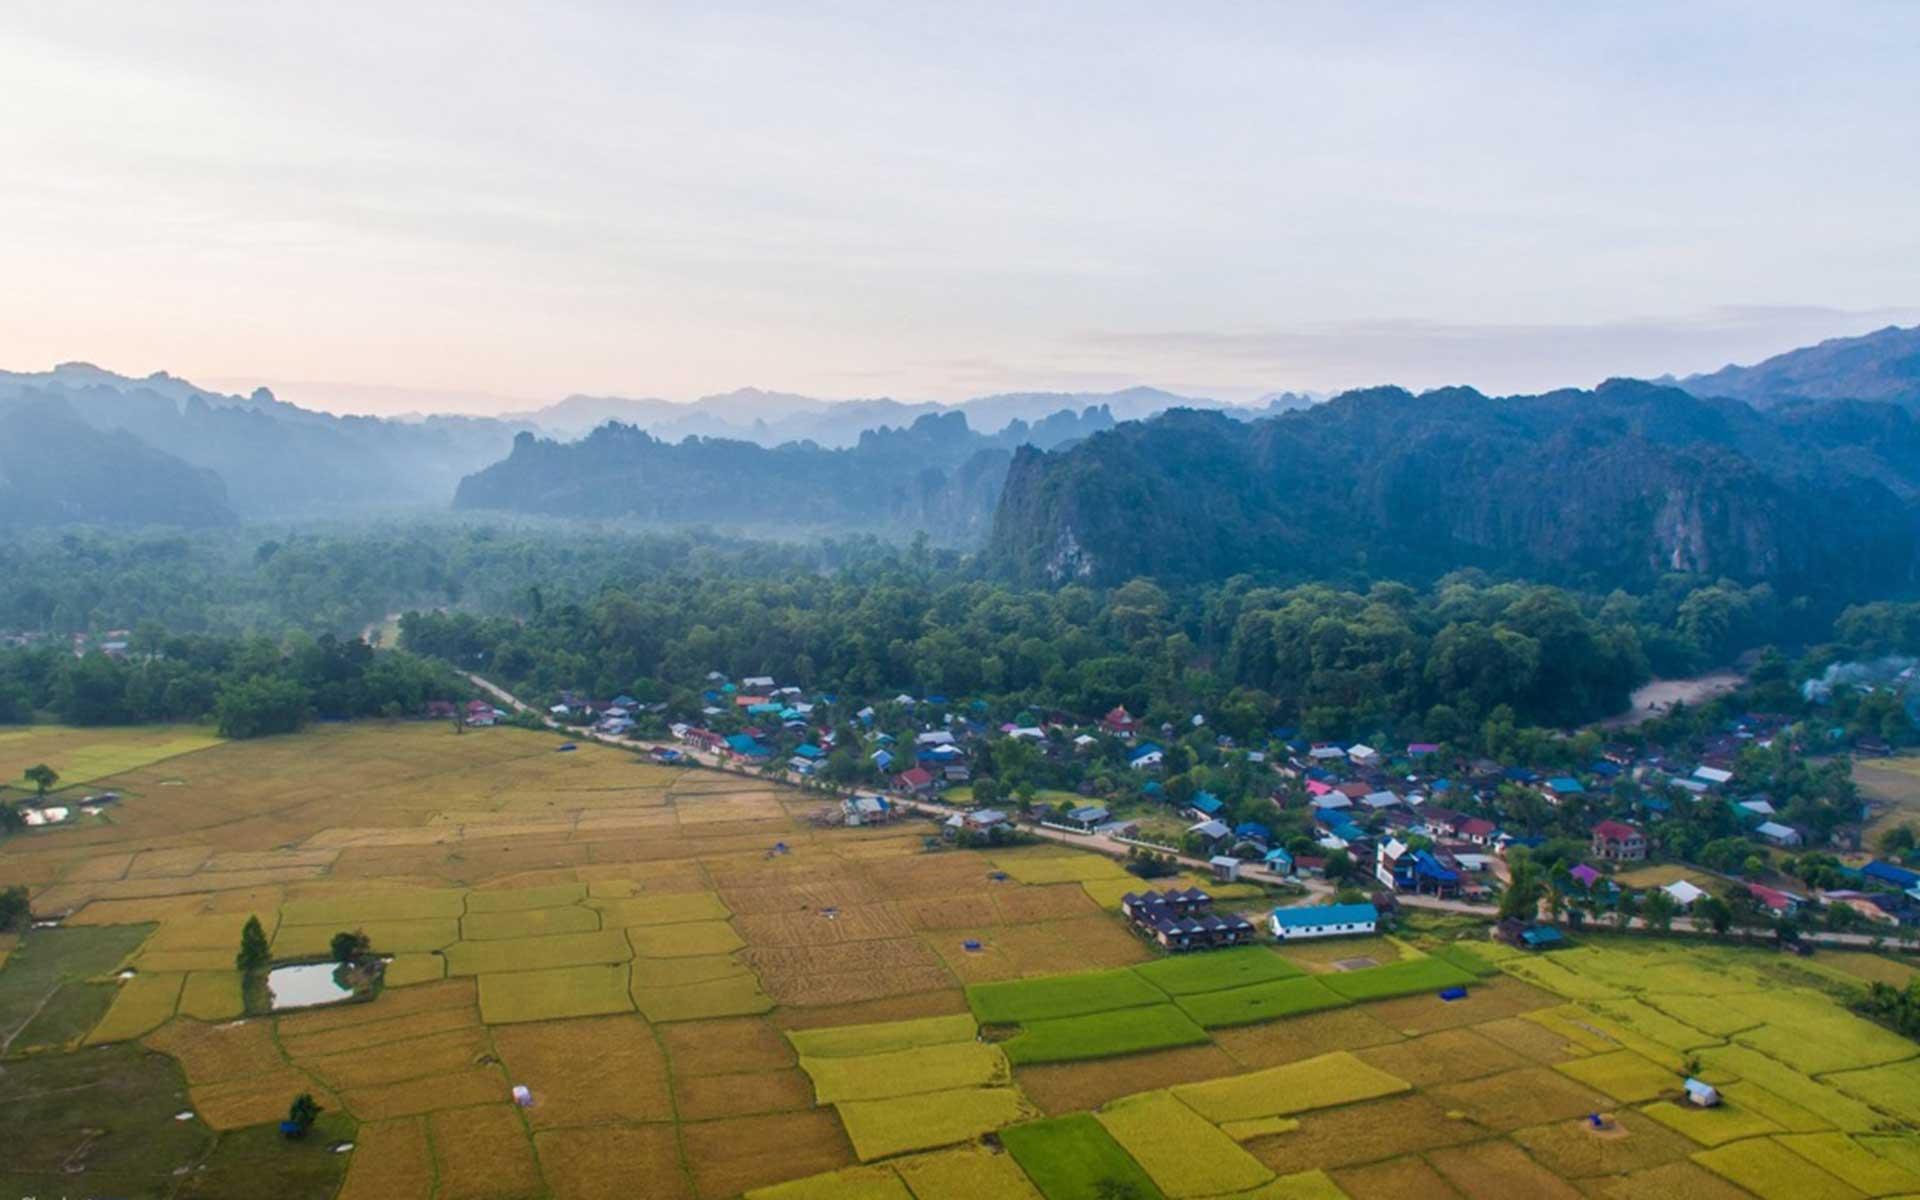 LAOS Laotravel 4 Laos Travel